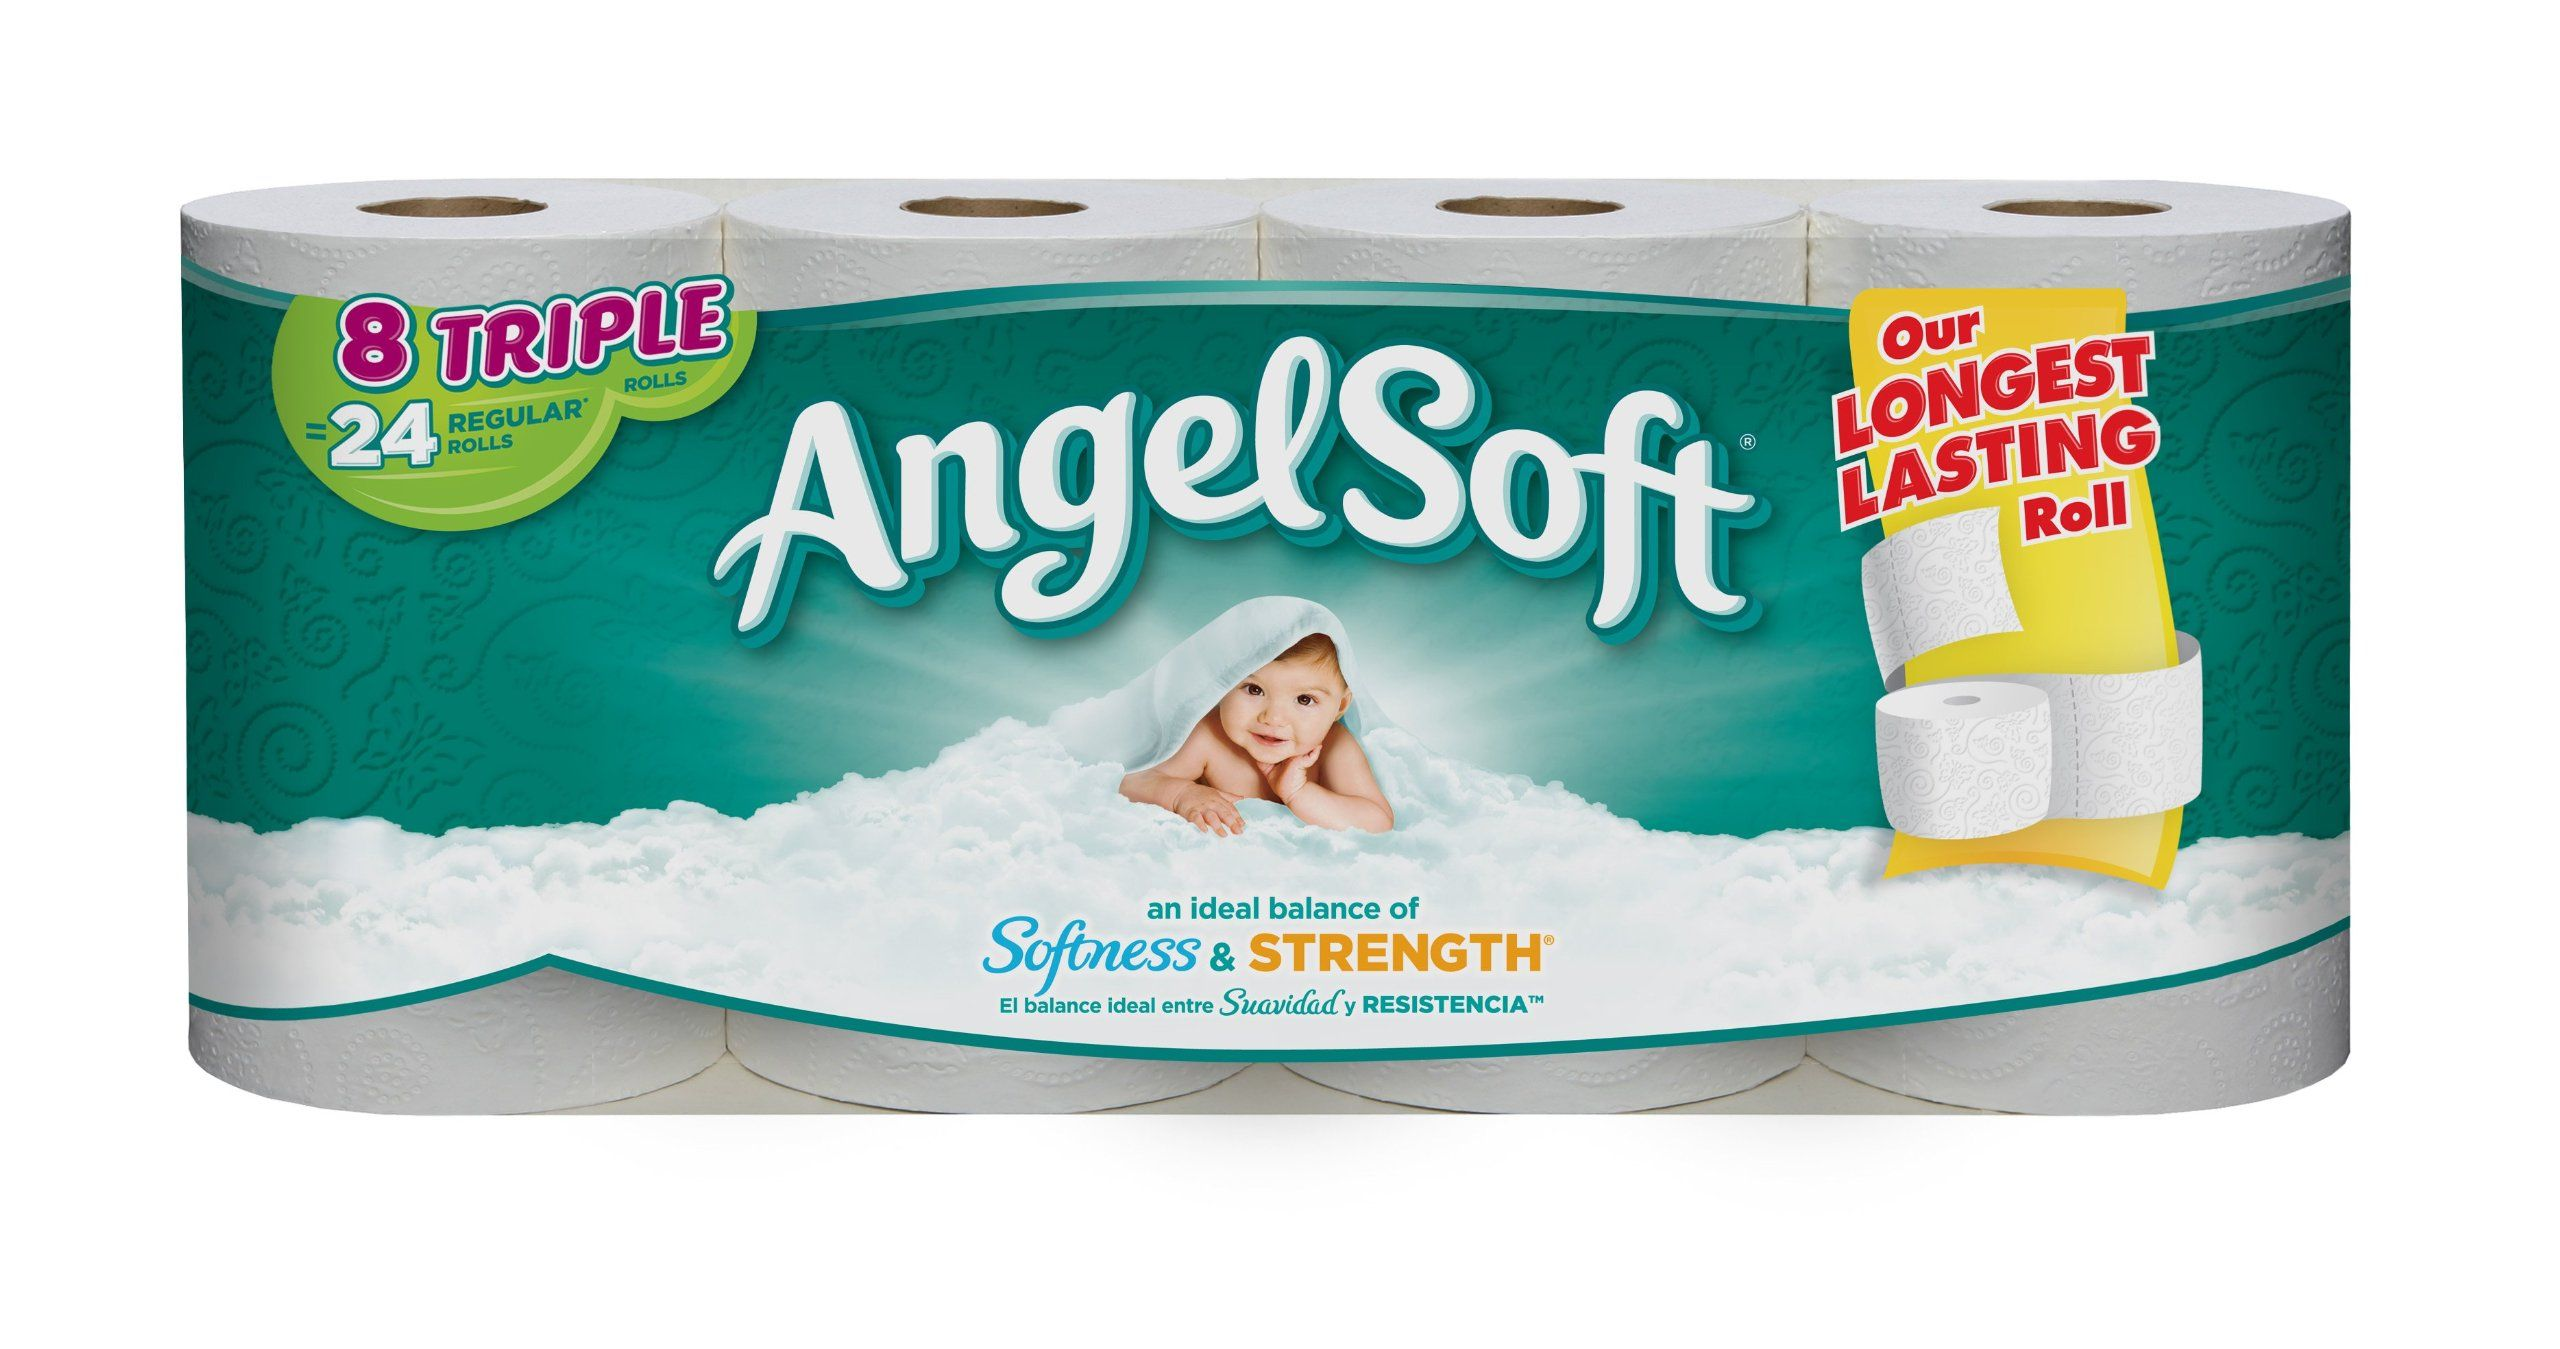 Angel soft bath tissue 8 triple rolls amazonfresh